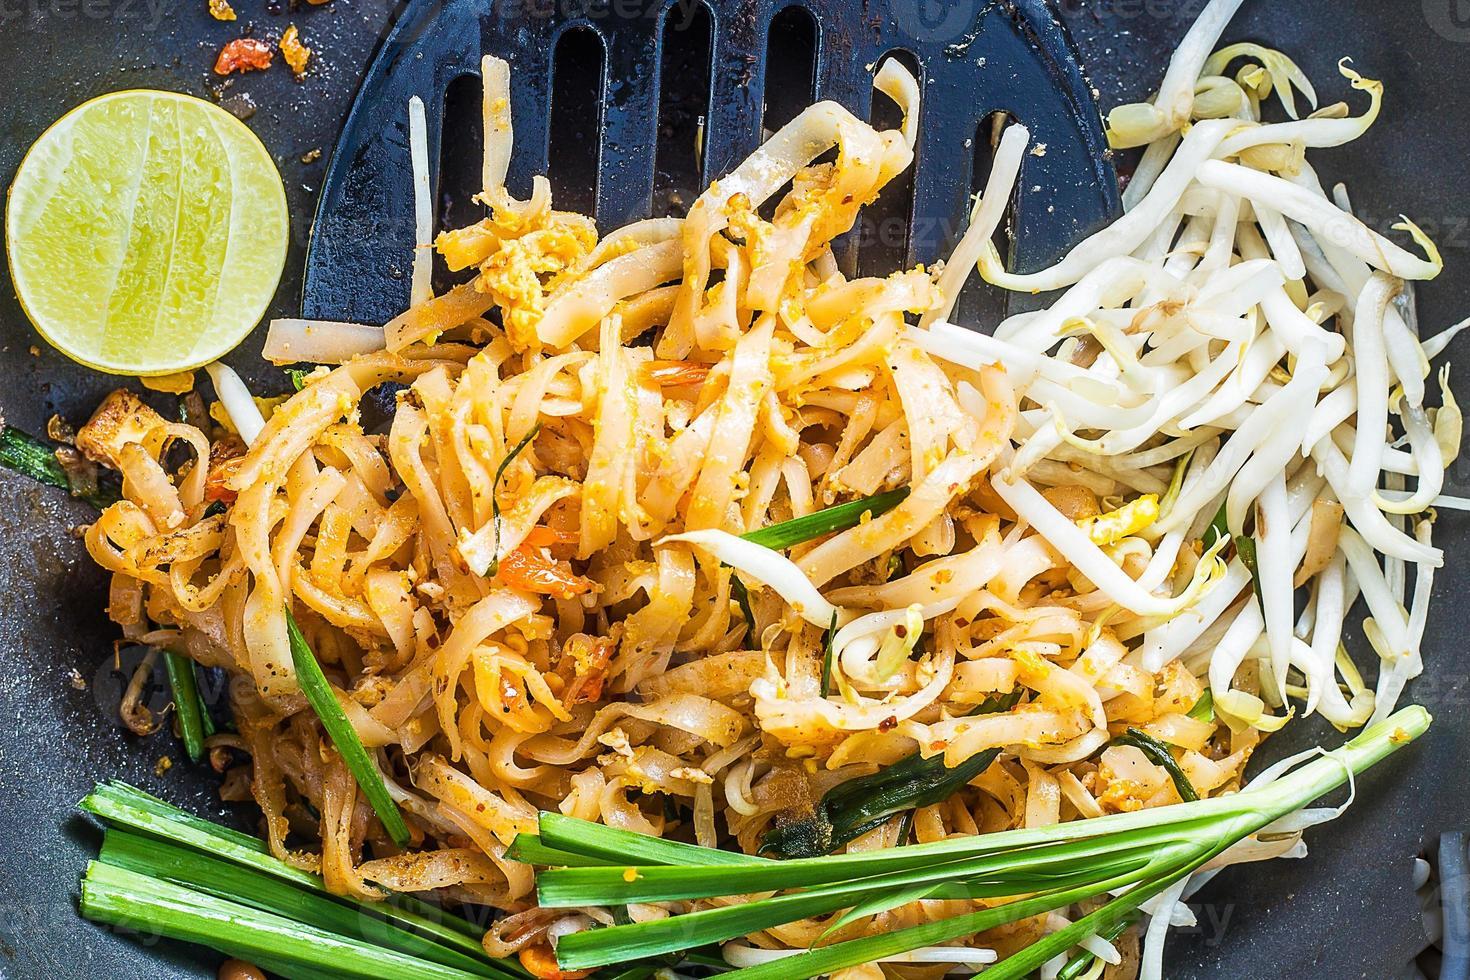 comida tailandesa - padthai quente na panela foto